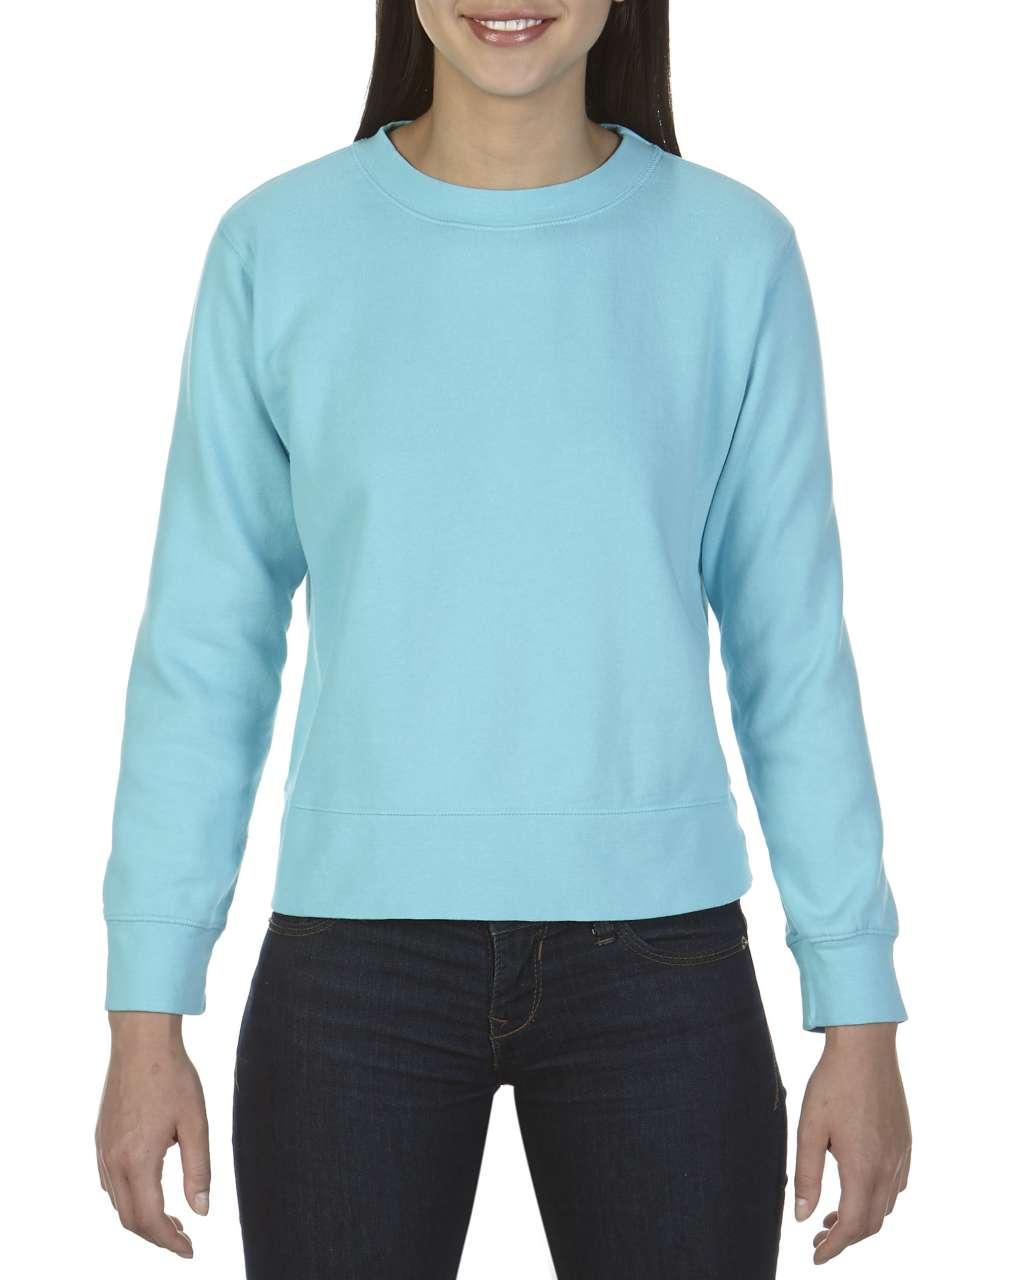 Levně Dámská mikina bez kapuce Comfort Colors – laguna modrá, vel. 2XL